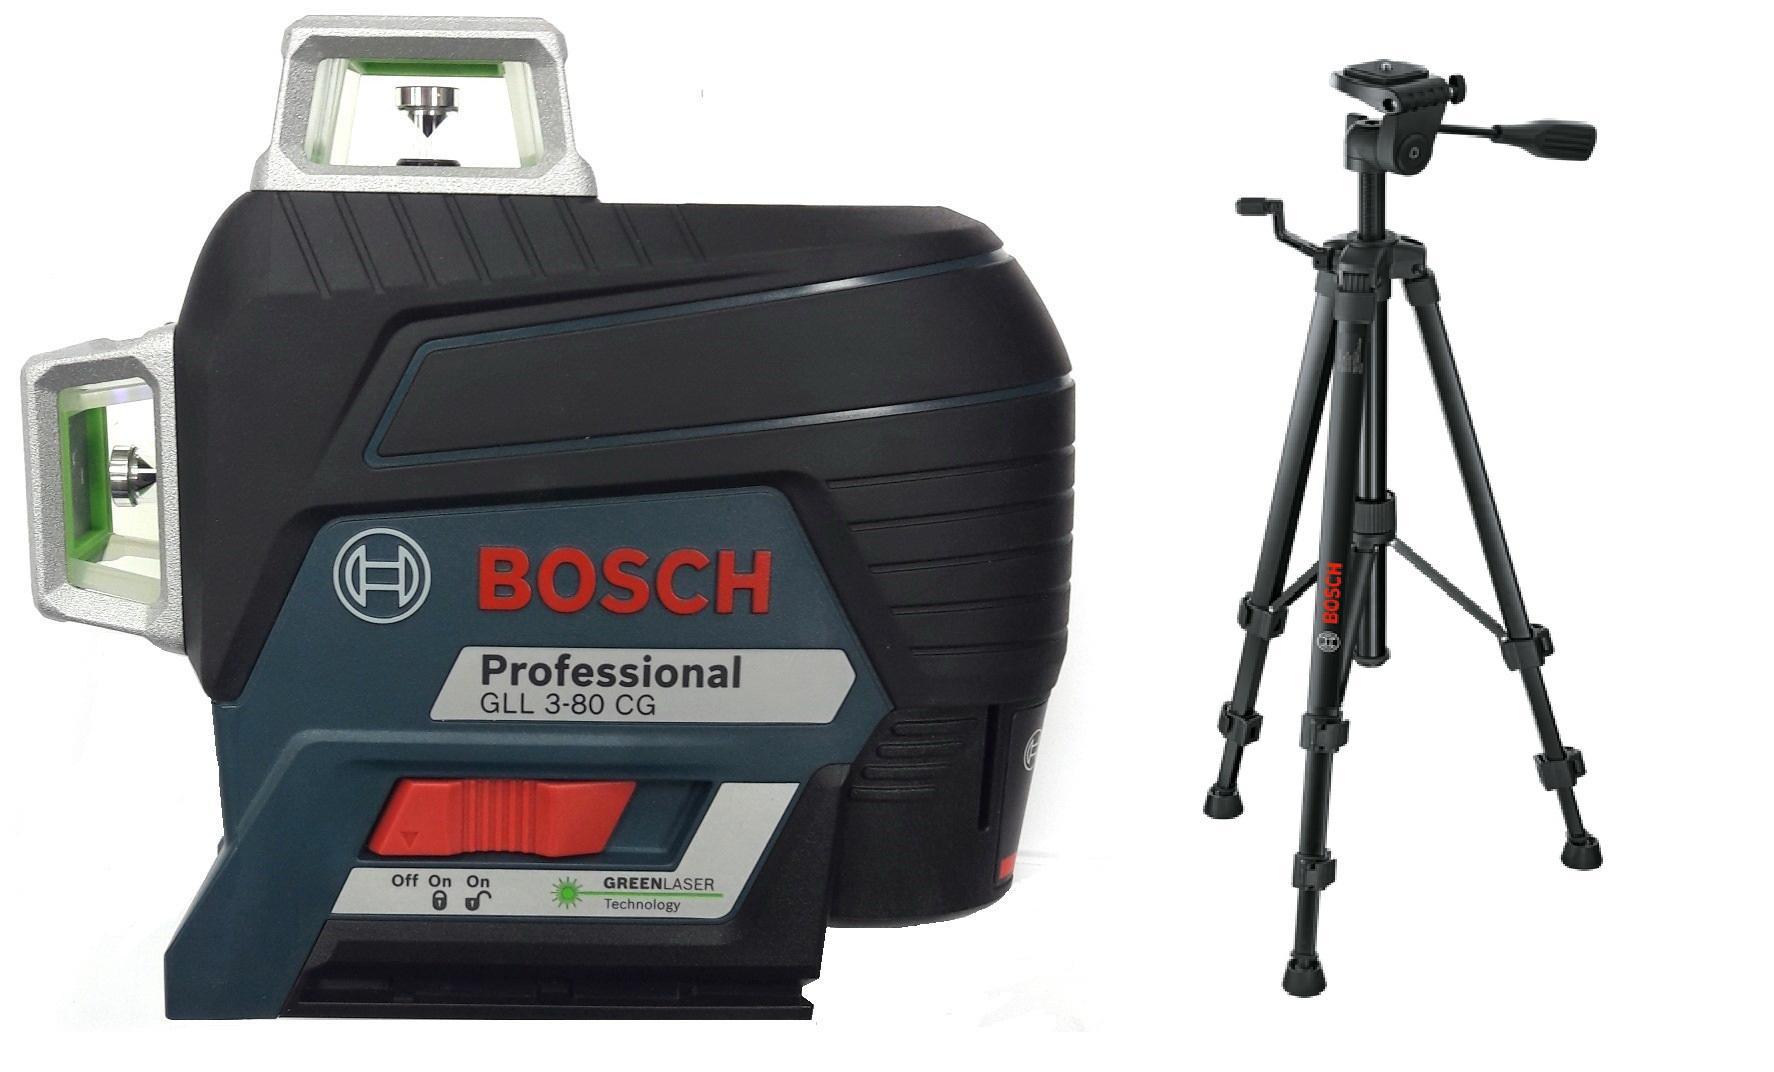 Набор Bosch Уровень gll 3-80cg+bm1+12v+l-boxx (0.601.063.t00) +Штатив bt 150 (0.601.096.b00) аккумуляторная дрель шуруповерт bosch gsr 12v 15 fc 2 0ah x2 l boxx 06019f6000